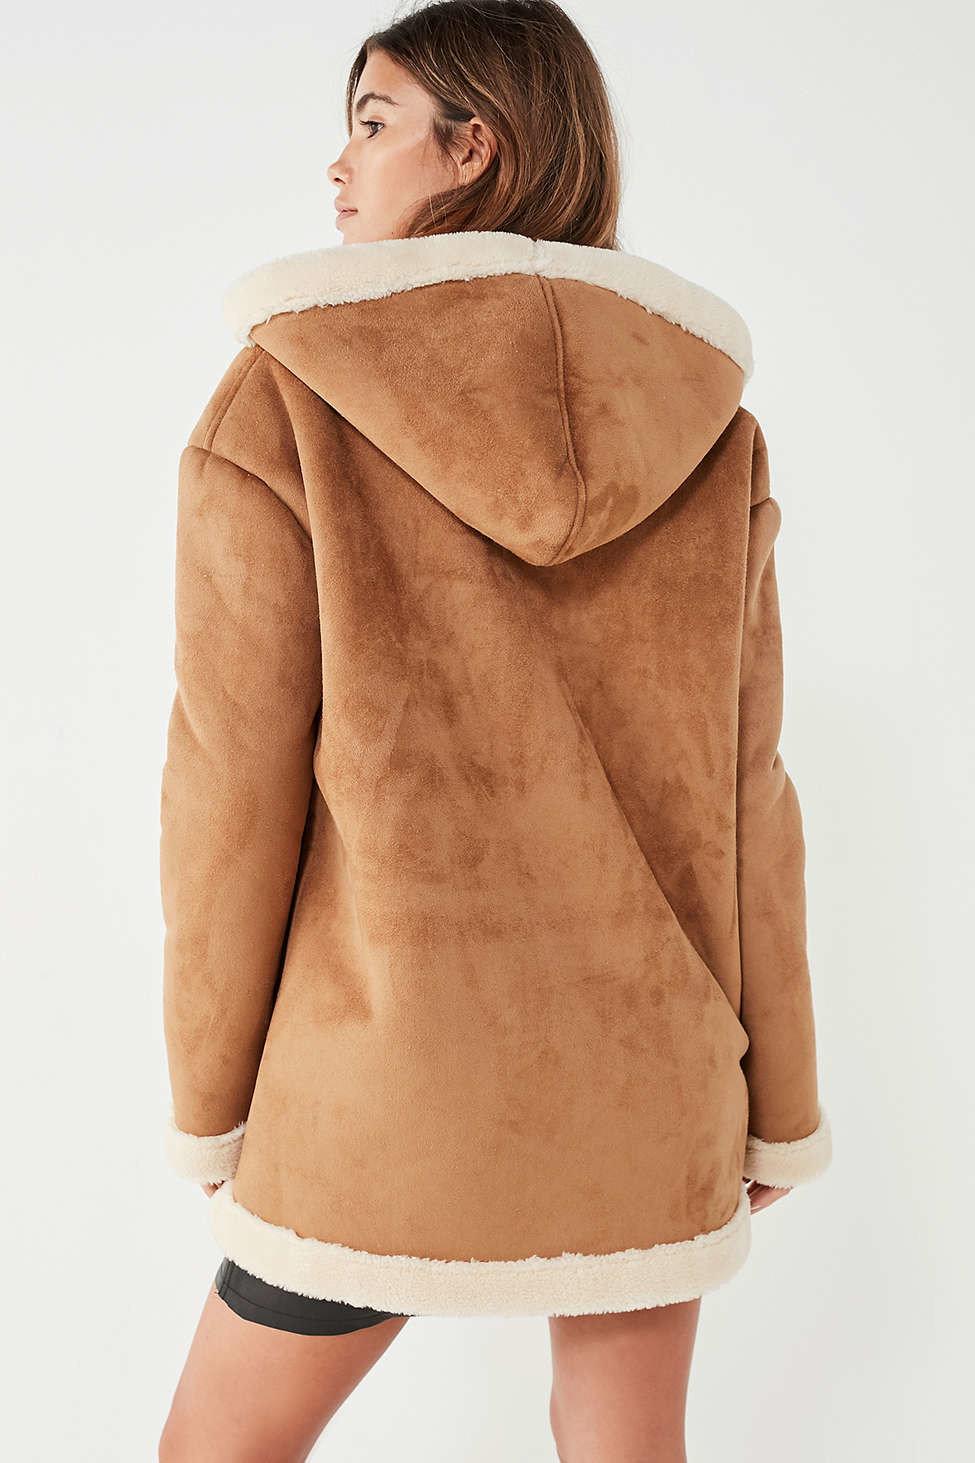 Style + Design Travel Shop person fur clothing fur hood wearing coat old beige jacket overcoat fashion model peach sleeve posing tan